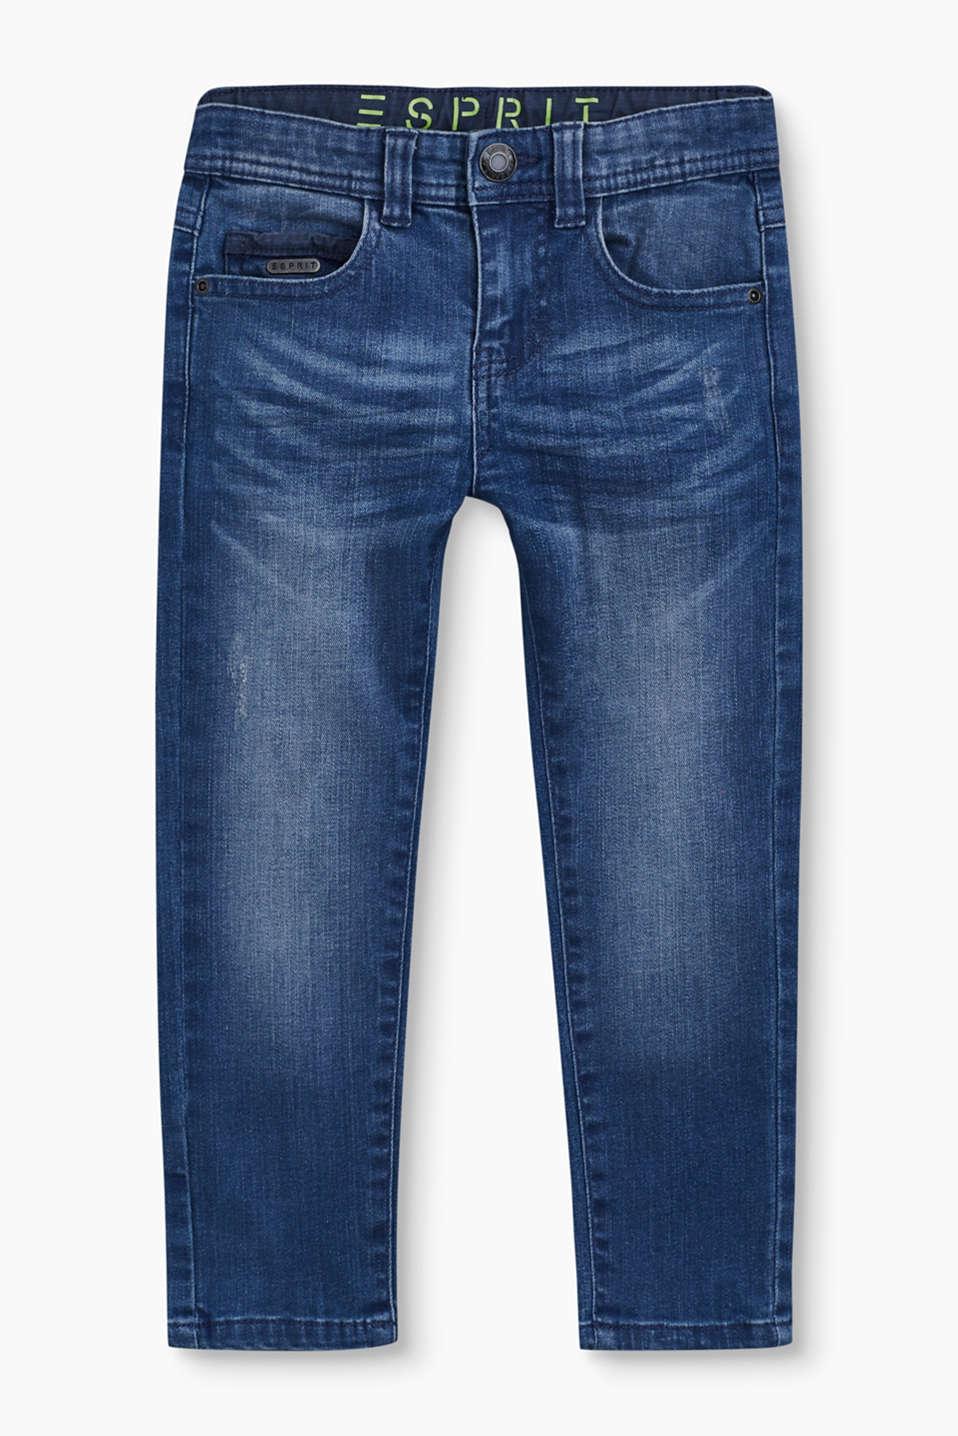 esprit 5 pocket jeans met destroyed look kopen in de online shop. Black Bedroom Furniture Sets. Home Design Ideas